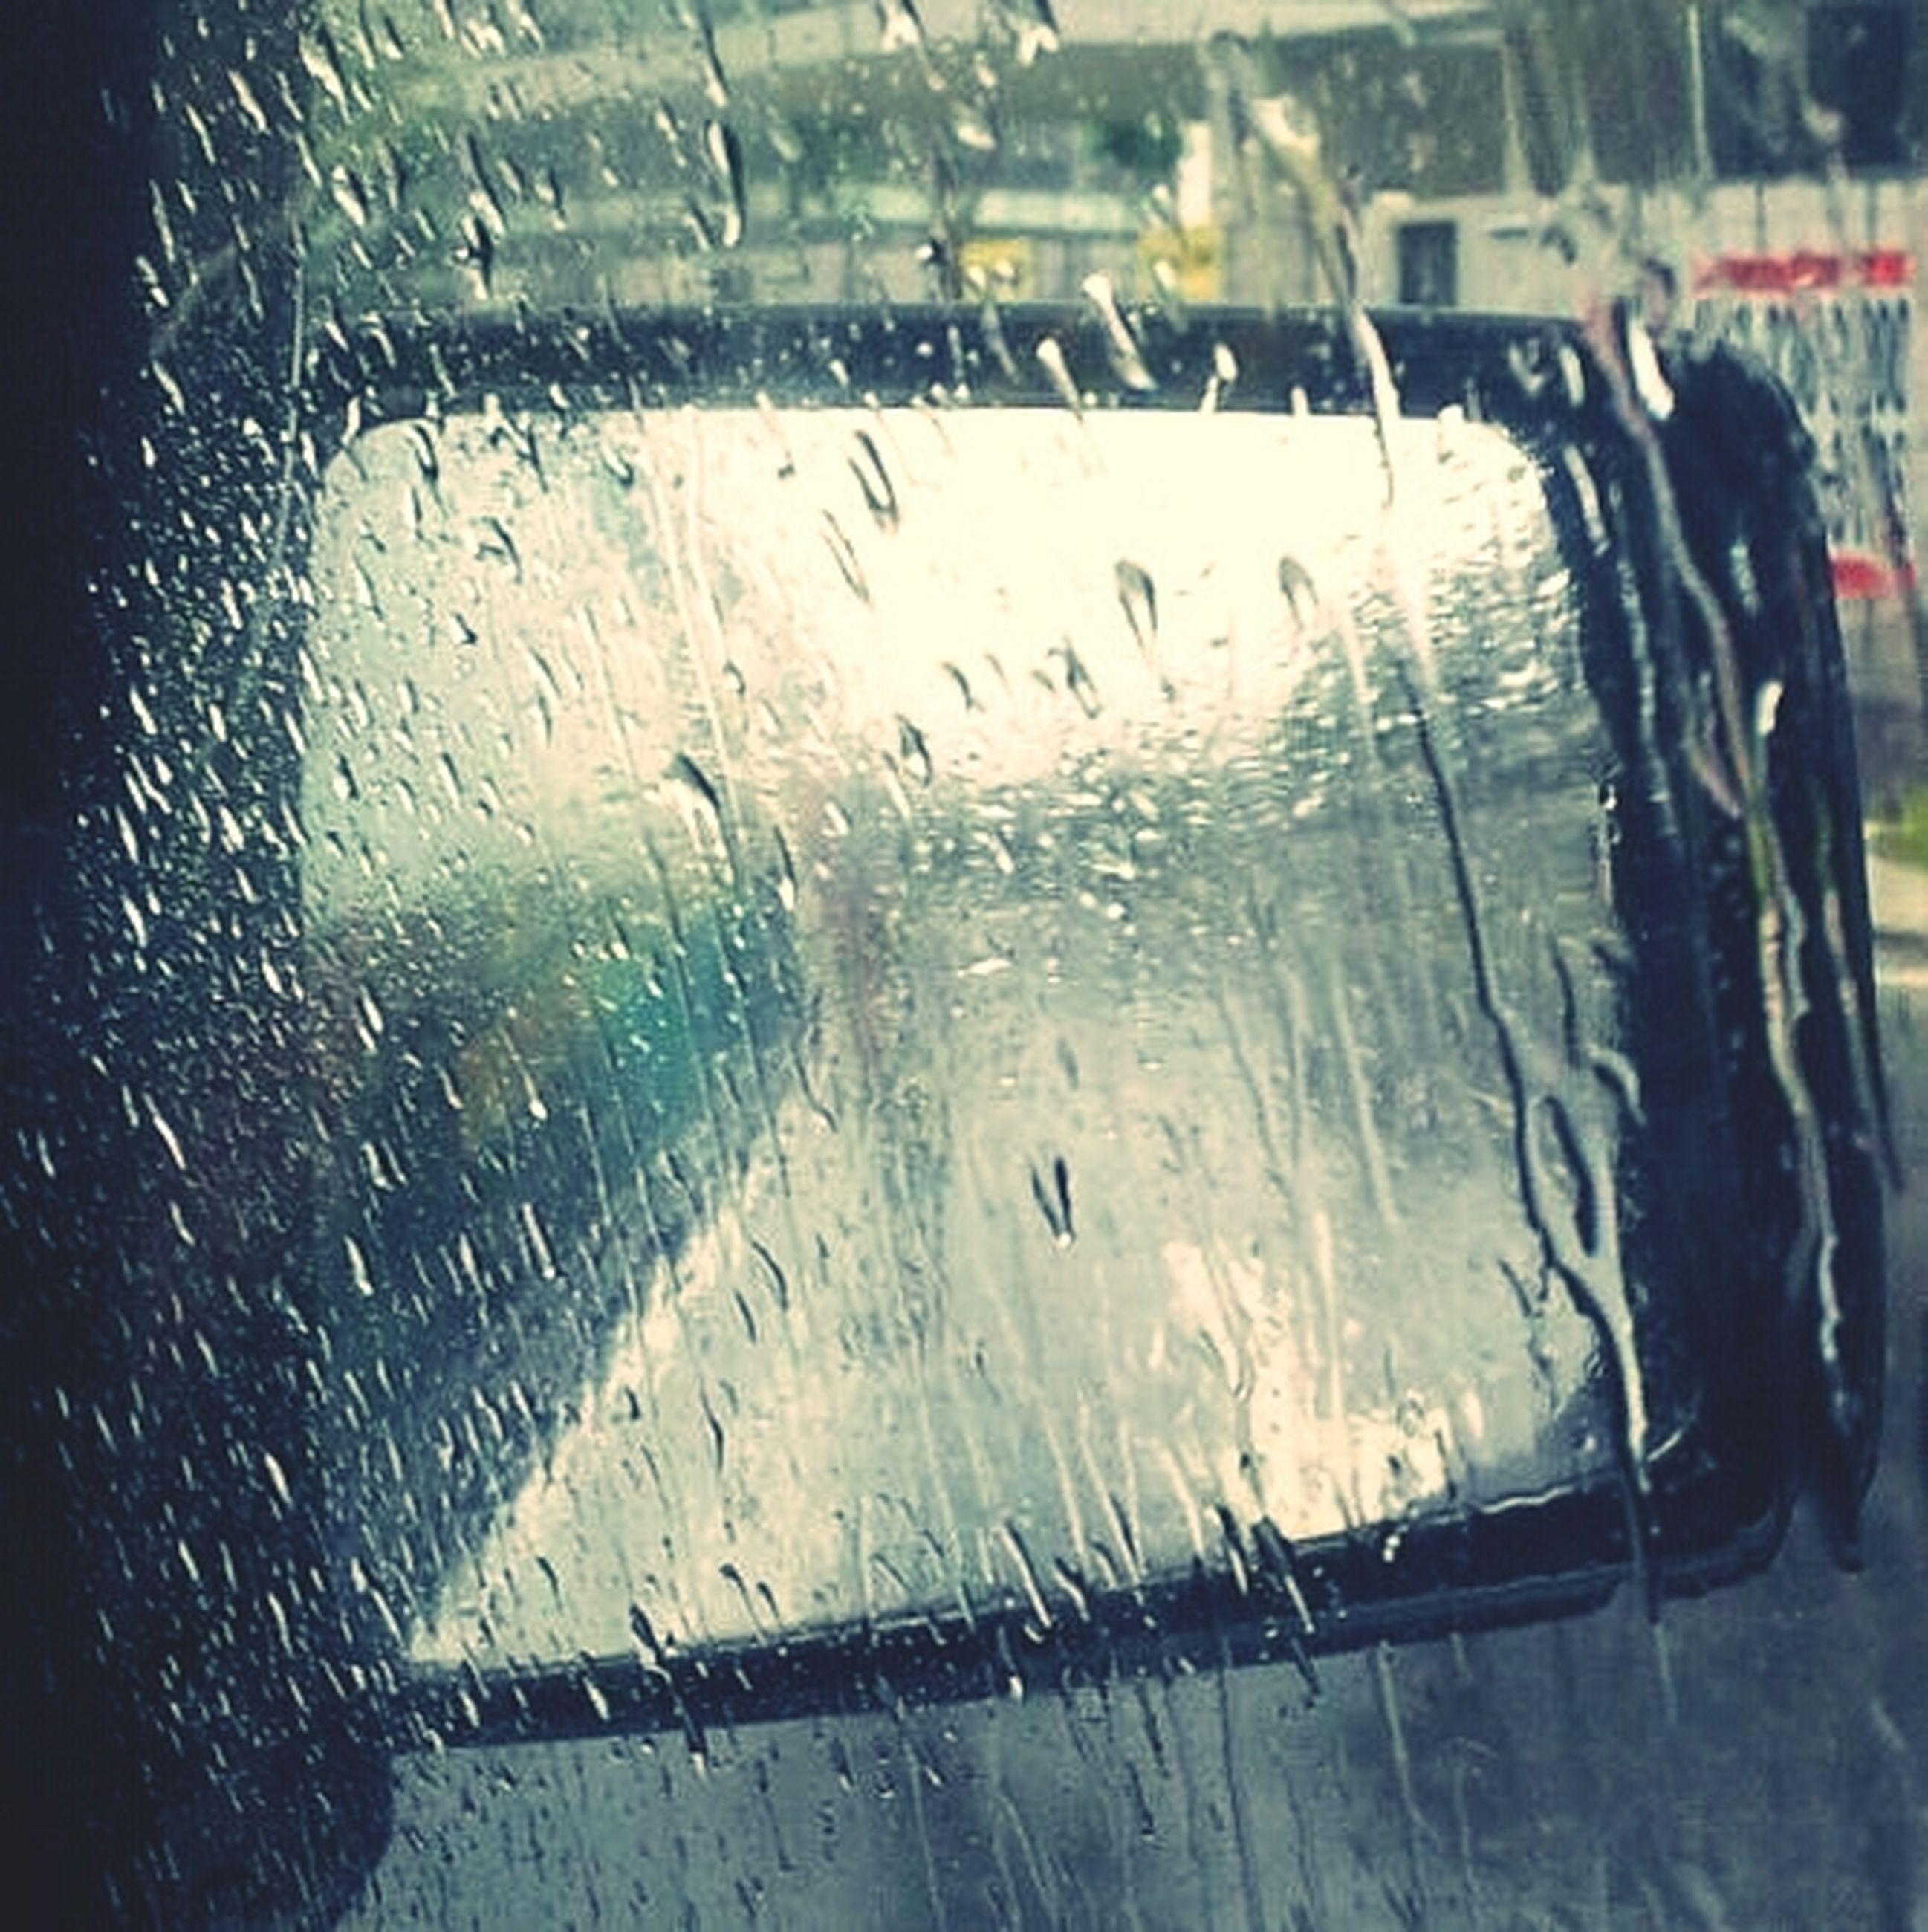 drop, wet, rain, window, glass - material, water, transportation, transparent, car, mode of transport, season, land vehicle, indoors, weather, vehicle interior, raindrop, close-up, windshield, monsoon, street